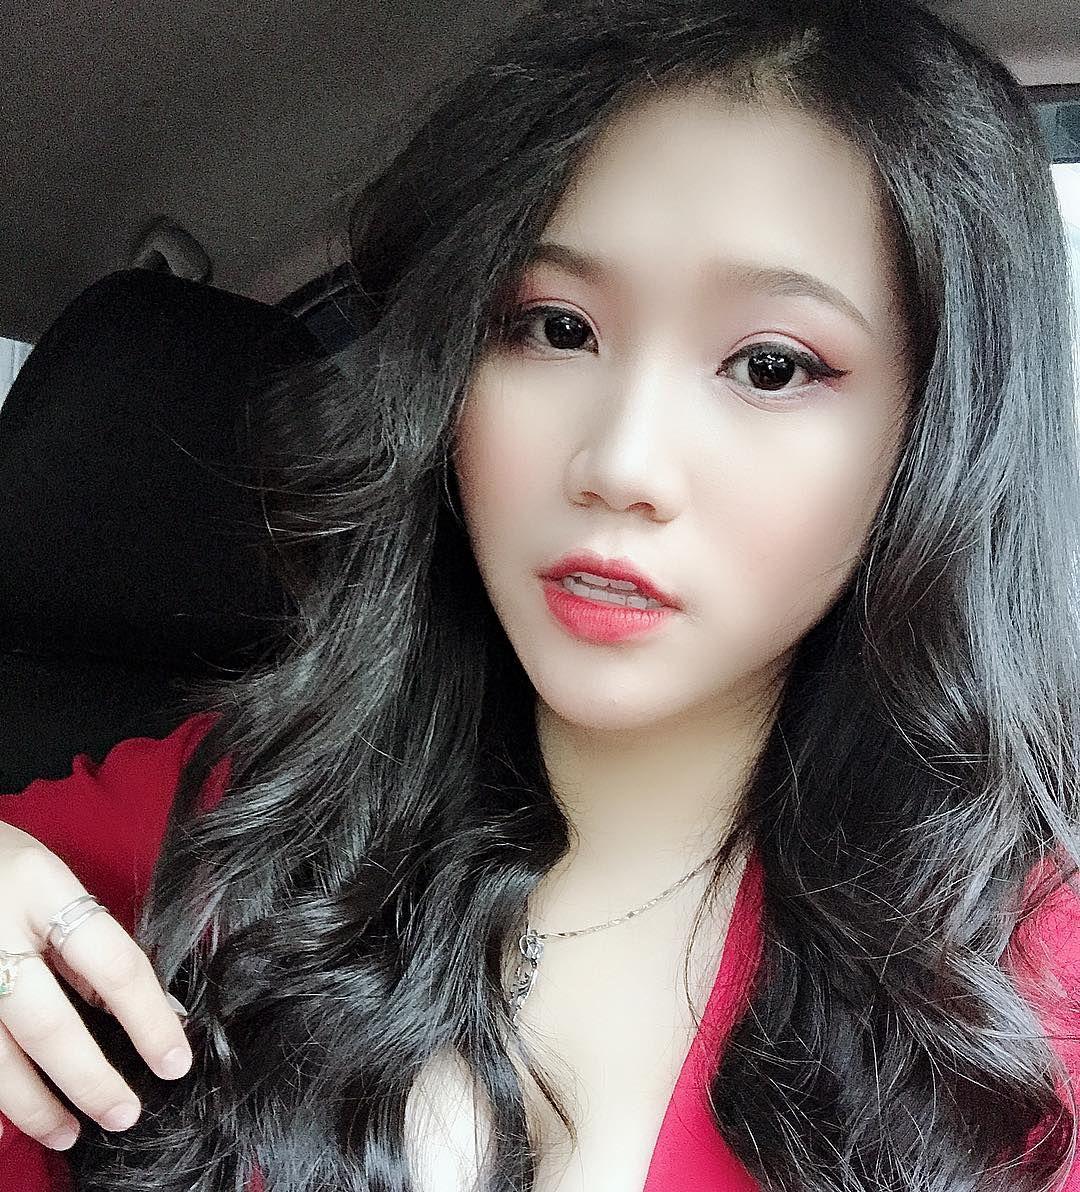 Hotgirl Quỳnh Na   E-CUP   WWW.DEPVAILON.COM   Page 1